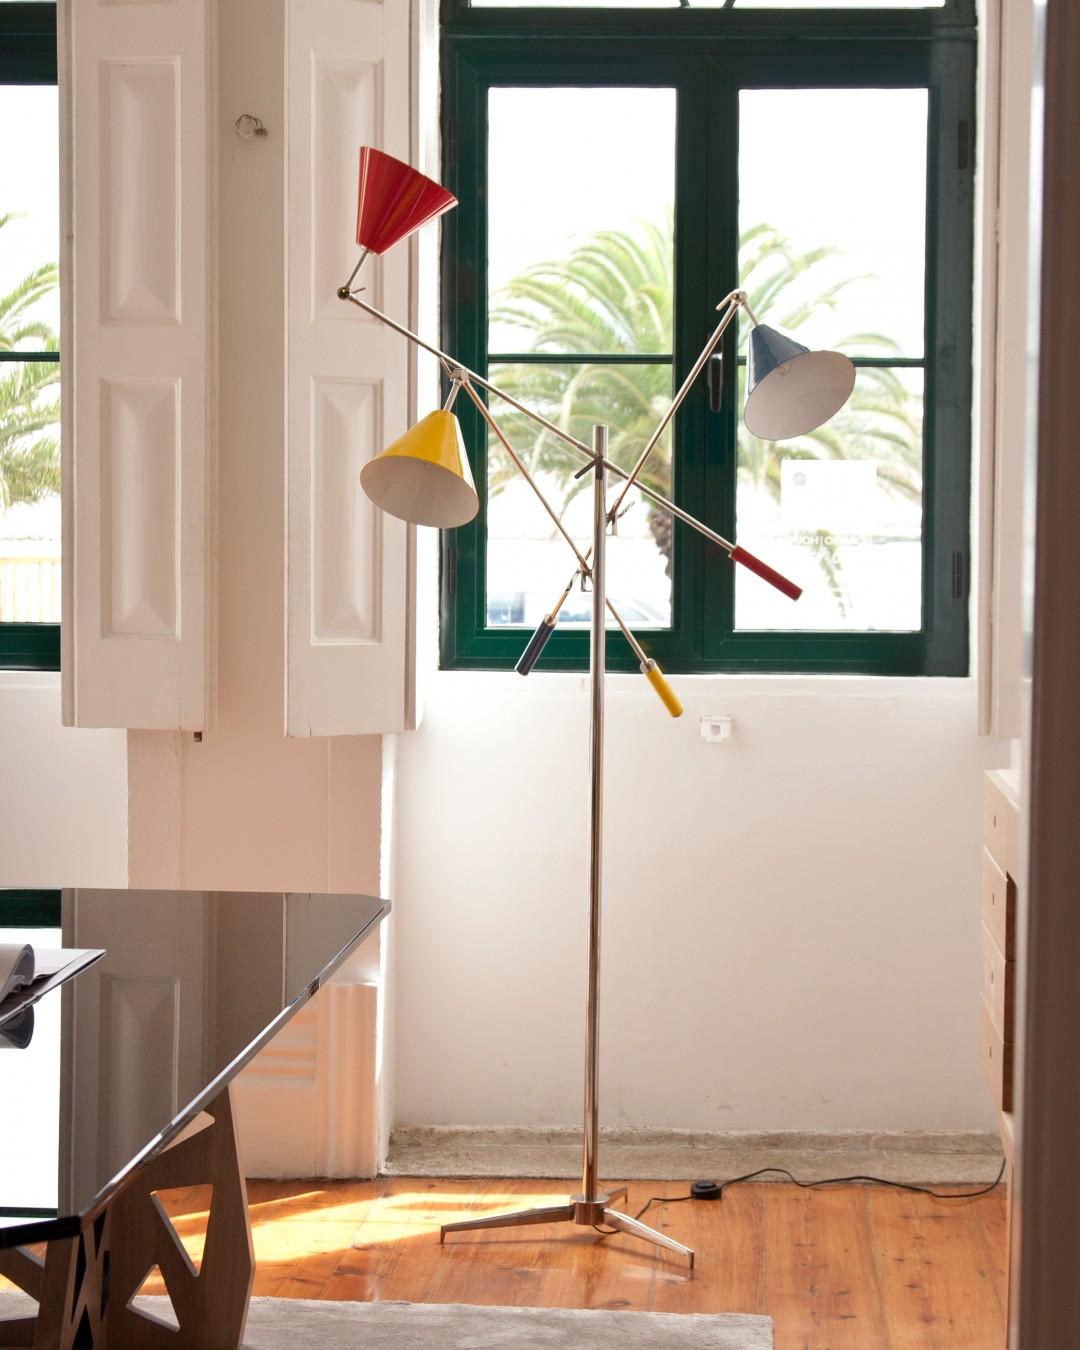 adjustable floor lamps adjustable floor lamps Best Deals On Adjustable Floor Lamps At Floor Samples! sinatra floor ambience 05 HR8e7f8689d7a83fc7740dcb1cc5574ce0